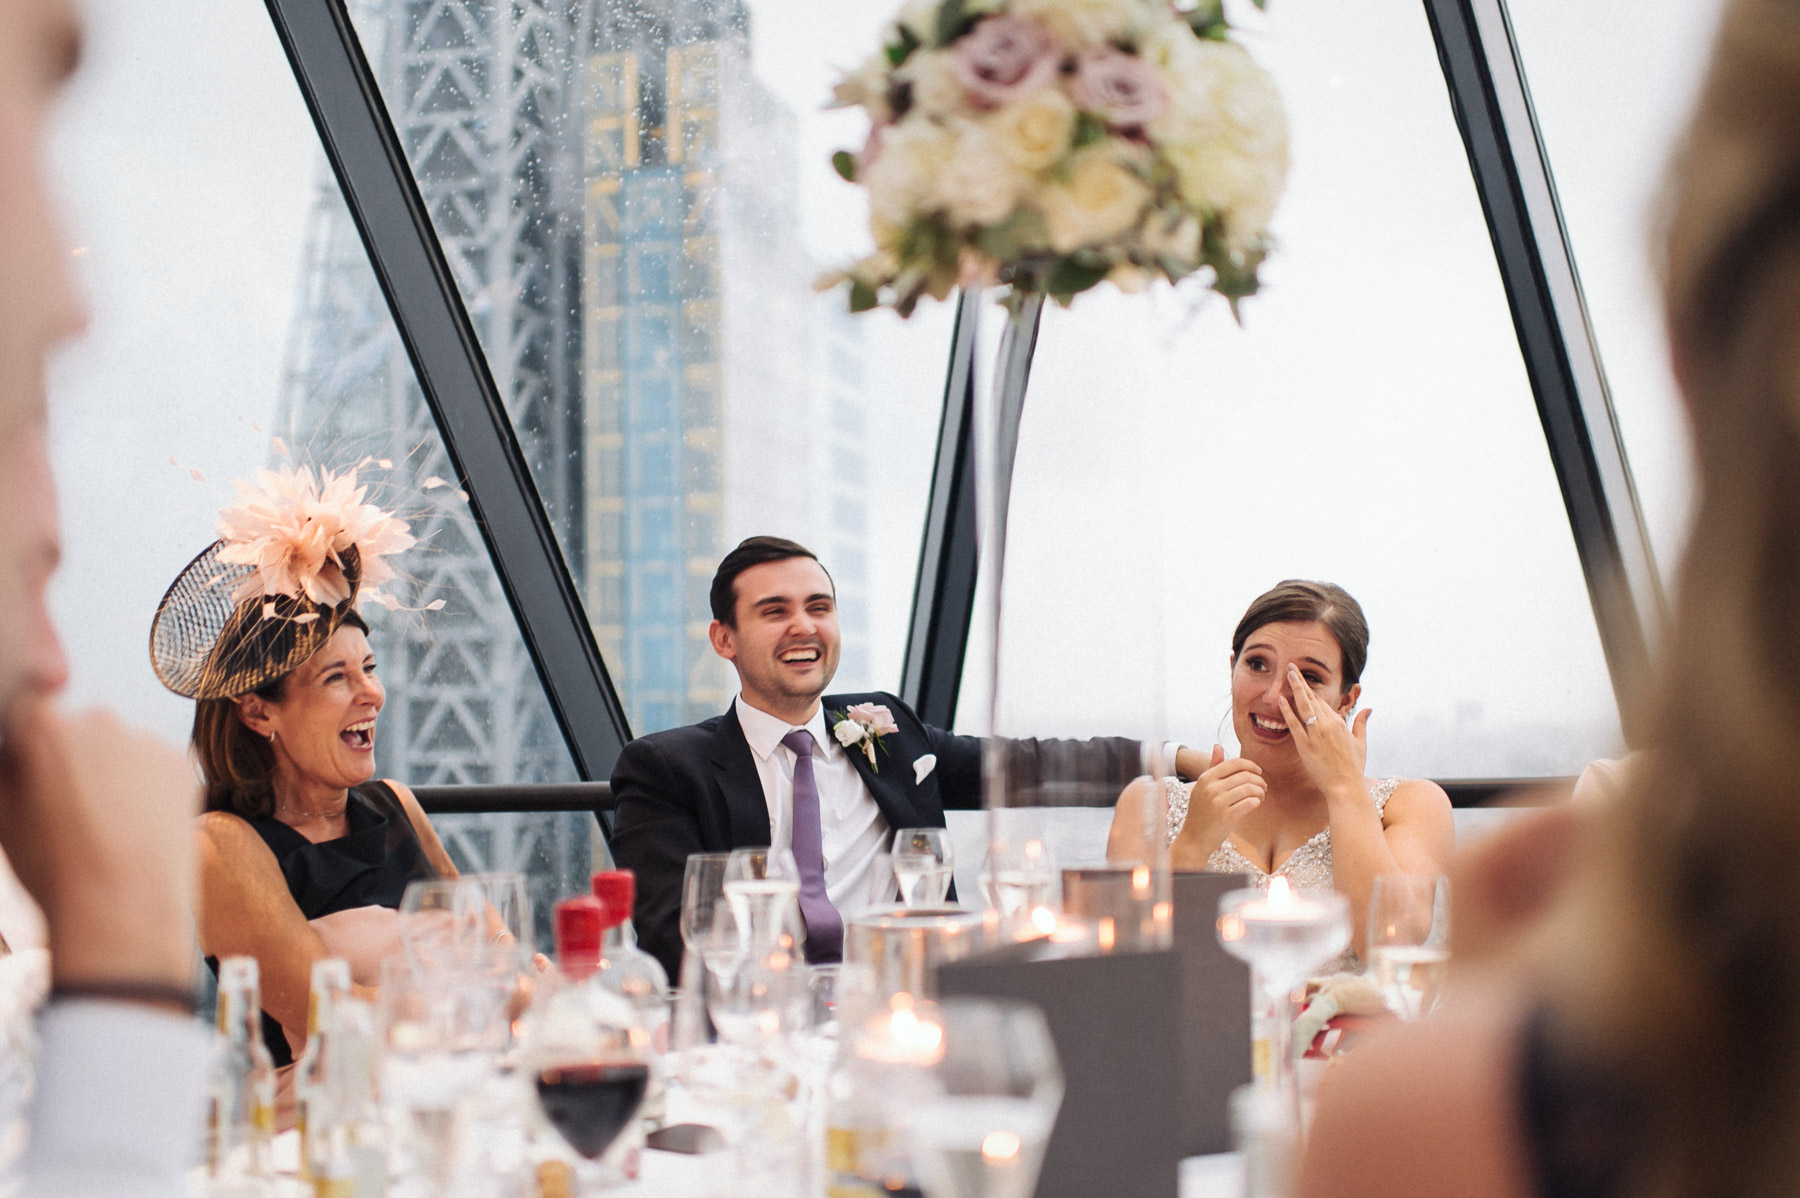 the bride wipes away happy tears